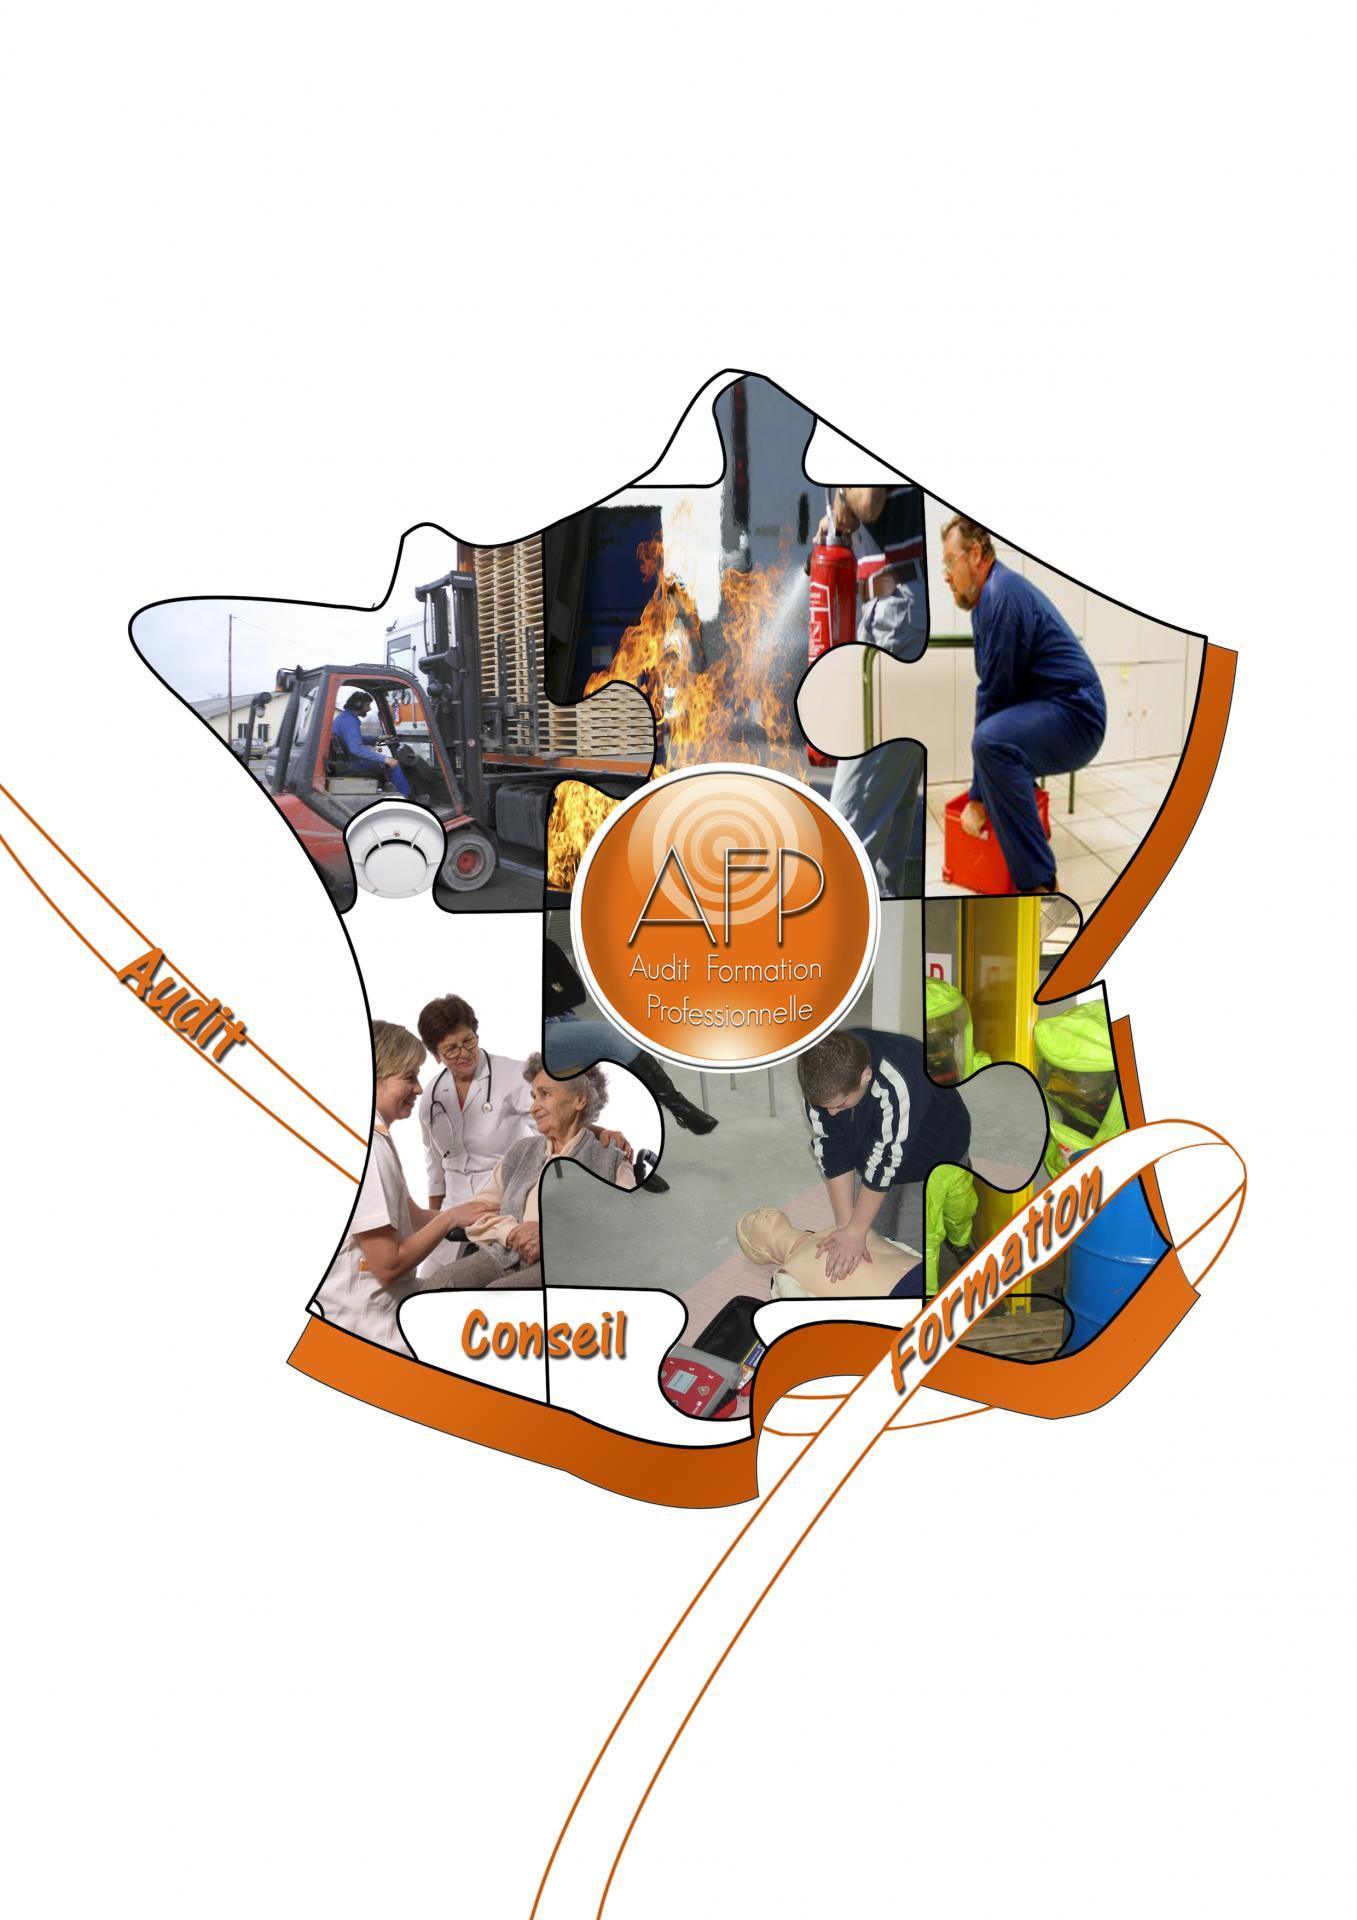 Afp logo carte 2